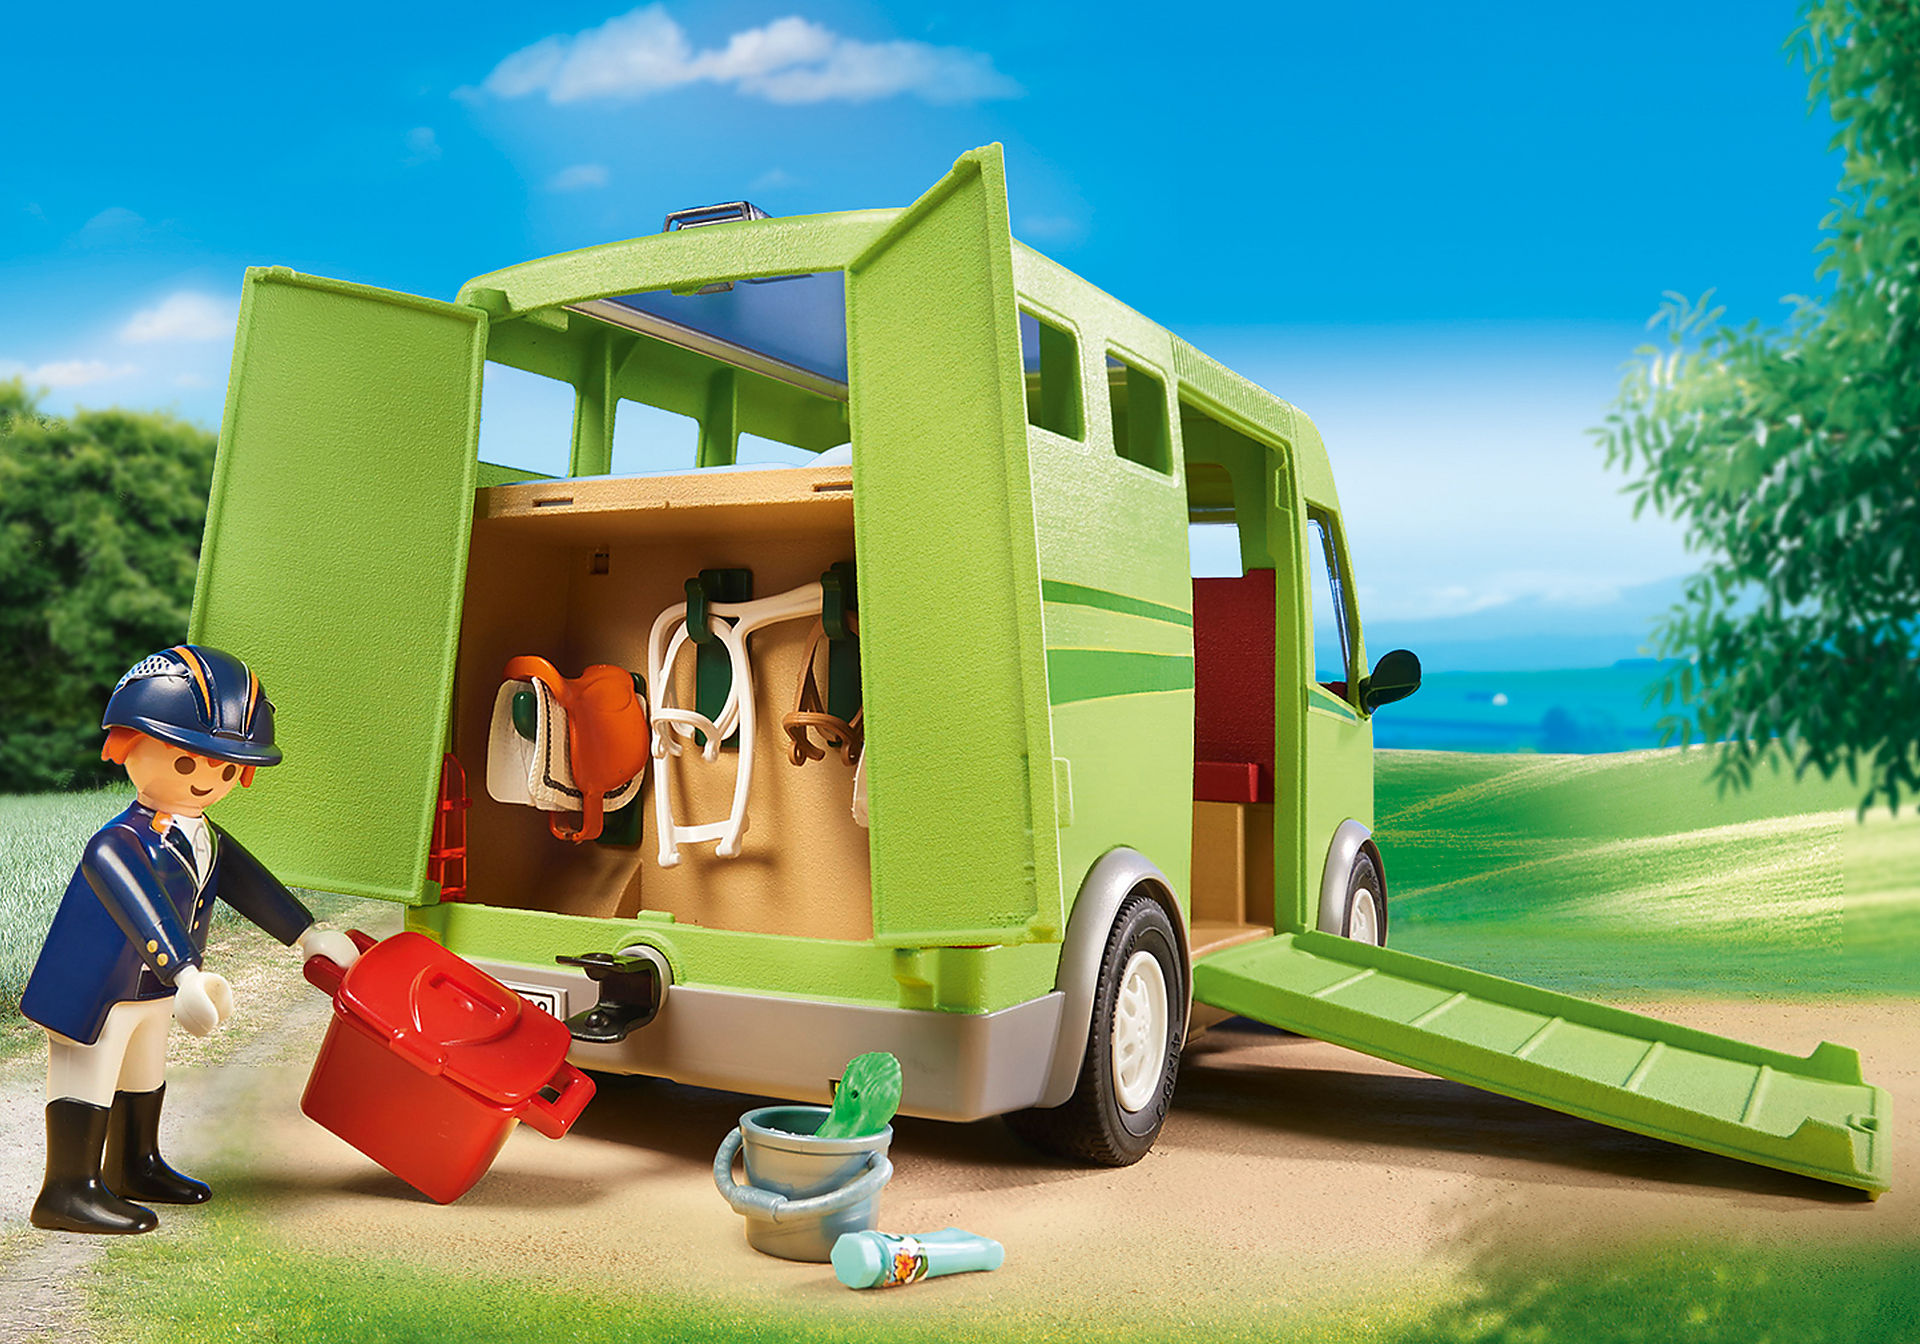 http://media.playmobil.com/i/playmobil/6928_product_extra2/Όχημα μεταφοράς αλόγων